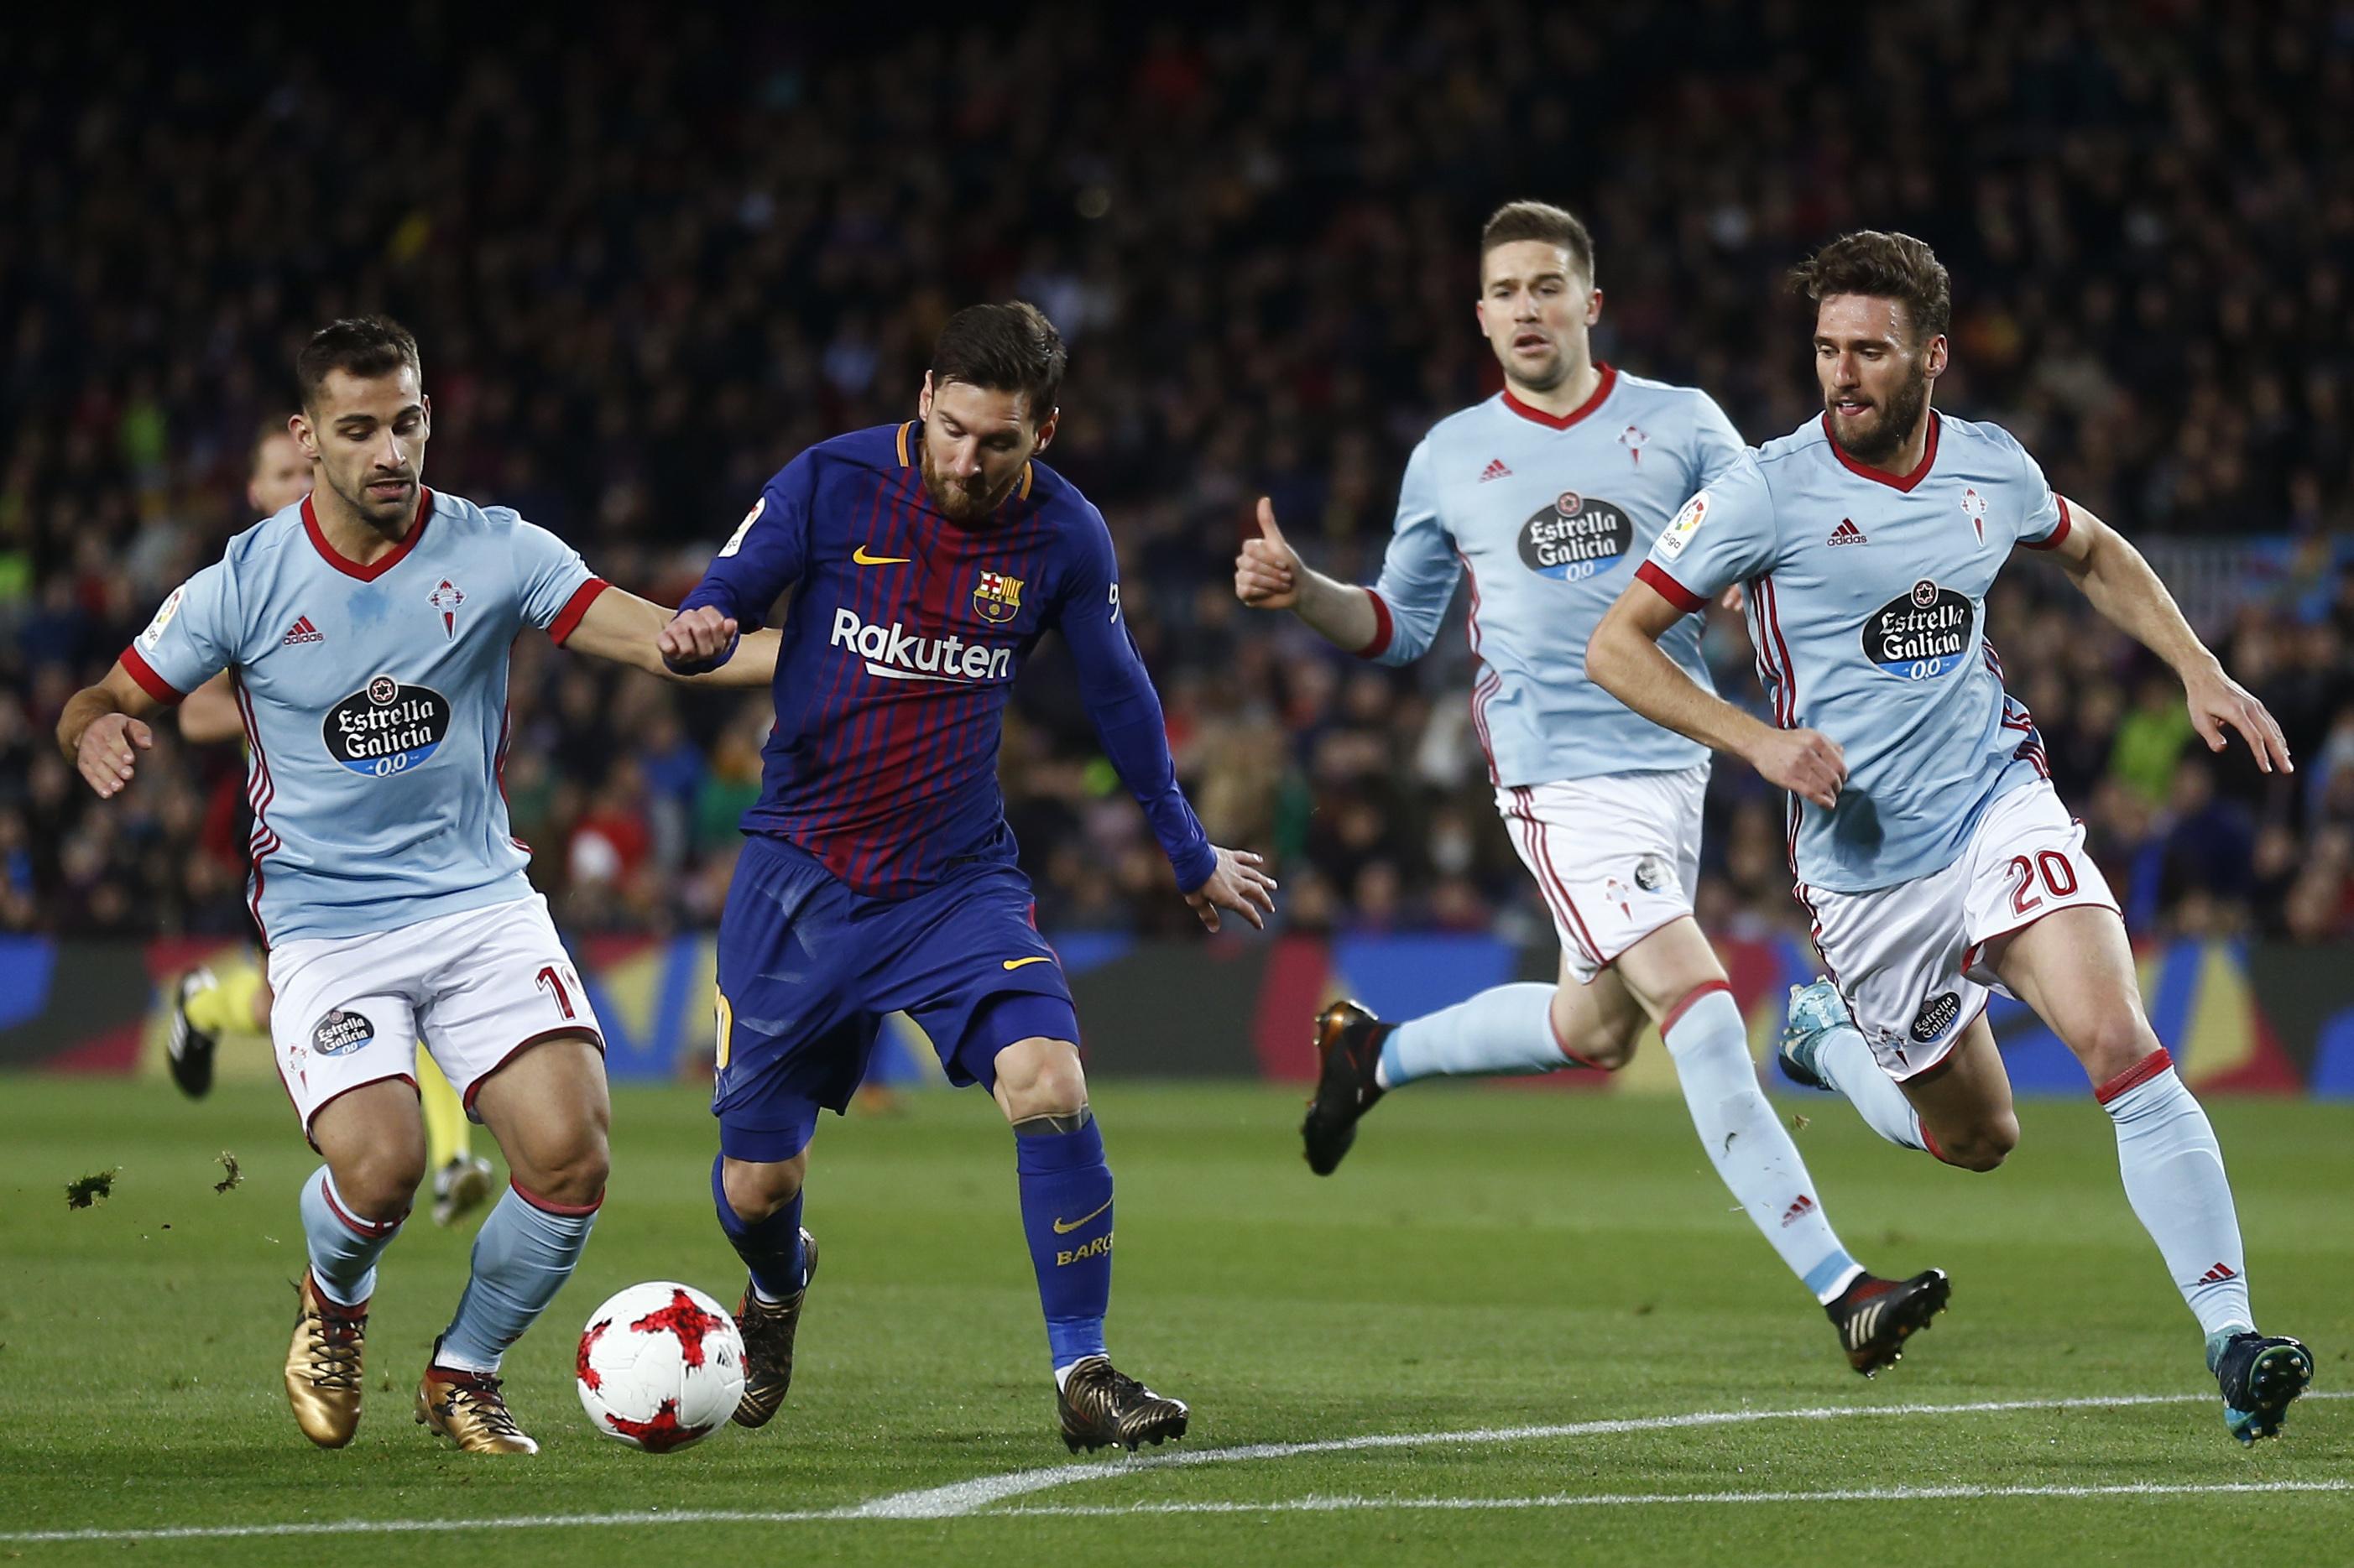 Lionel Messi brace puts FC Barcelona in Copa del Rey quarterfinals